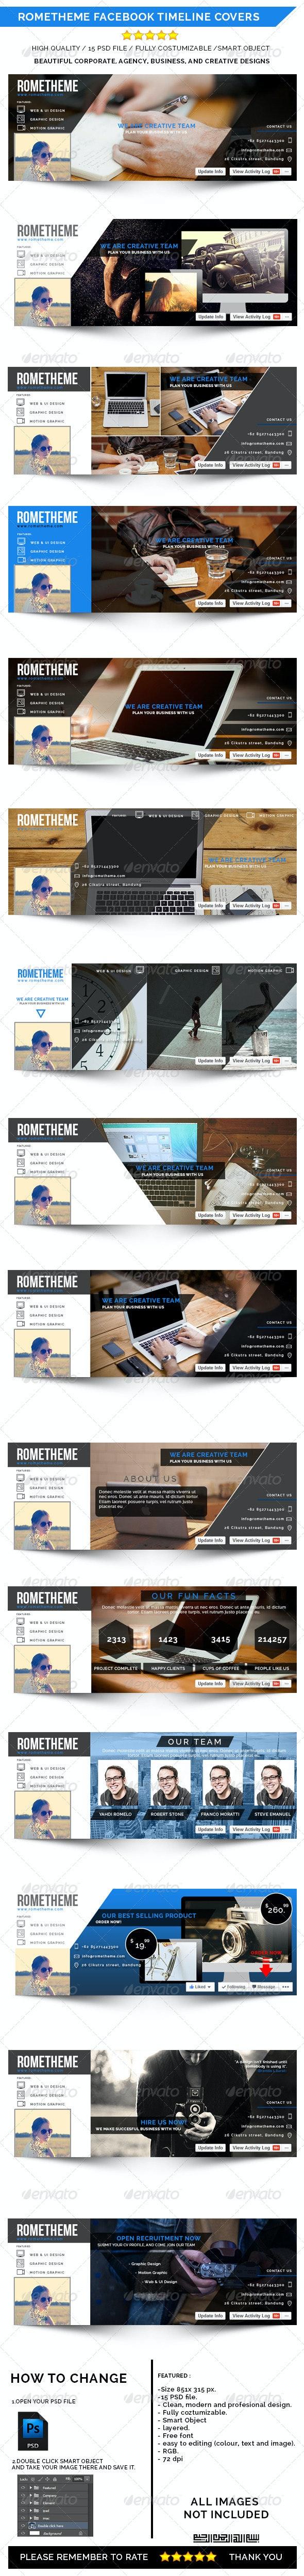 Rometheme Facebook Timeline Cover - Facebook Timeline Covers Social Media